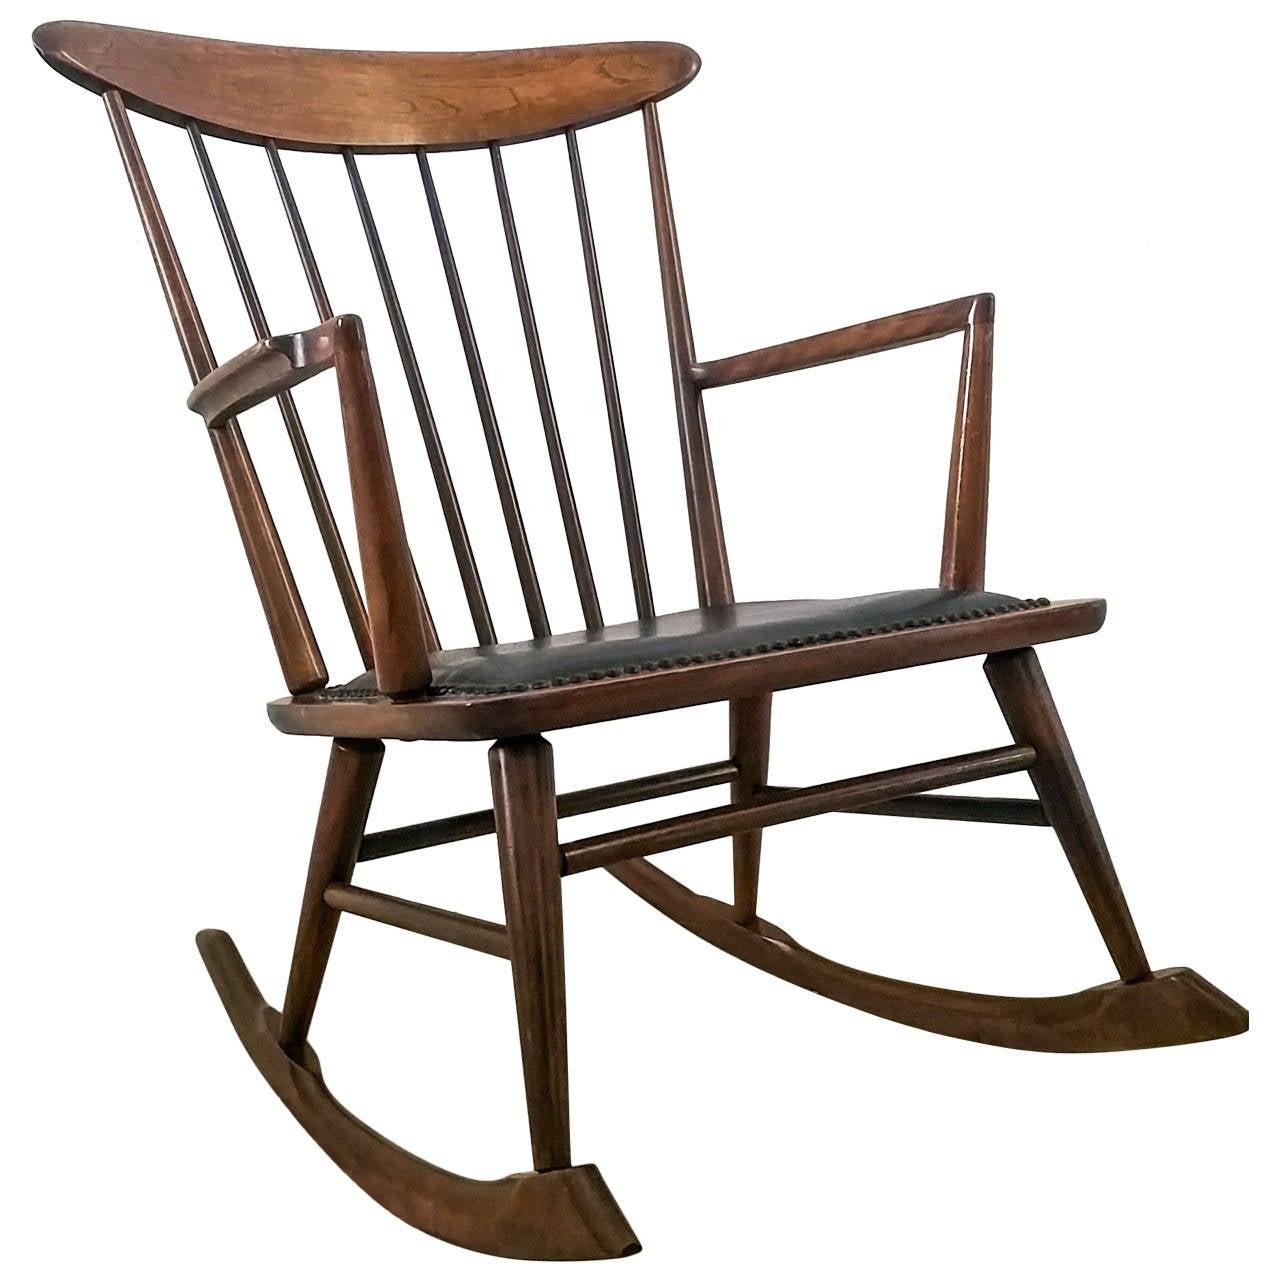 danish modern rocking chair the wooden sculptural at 1stdibs